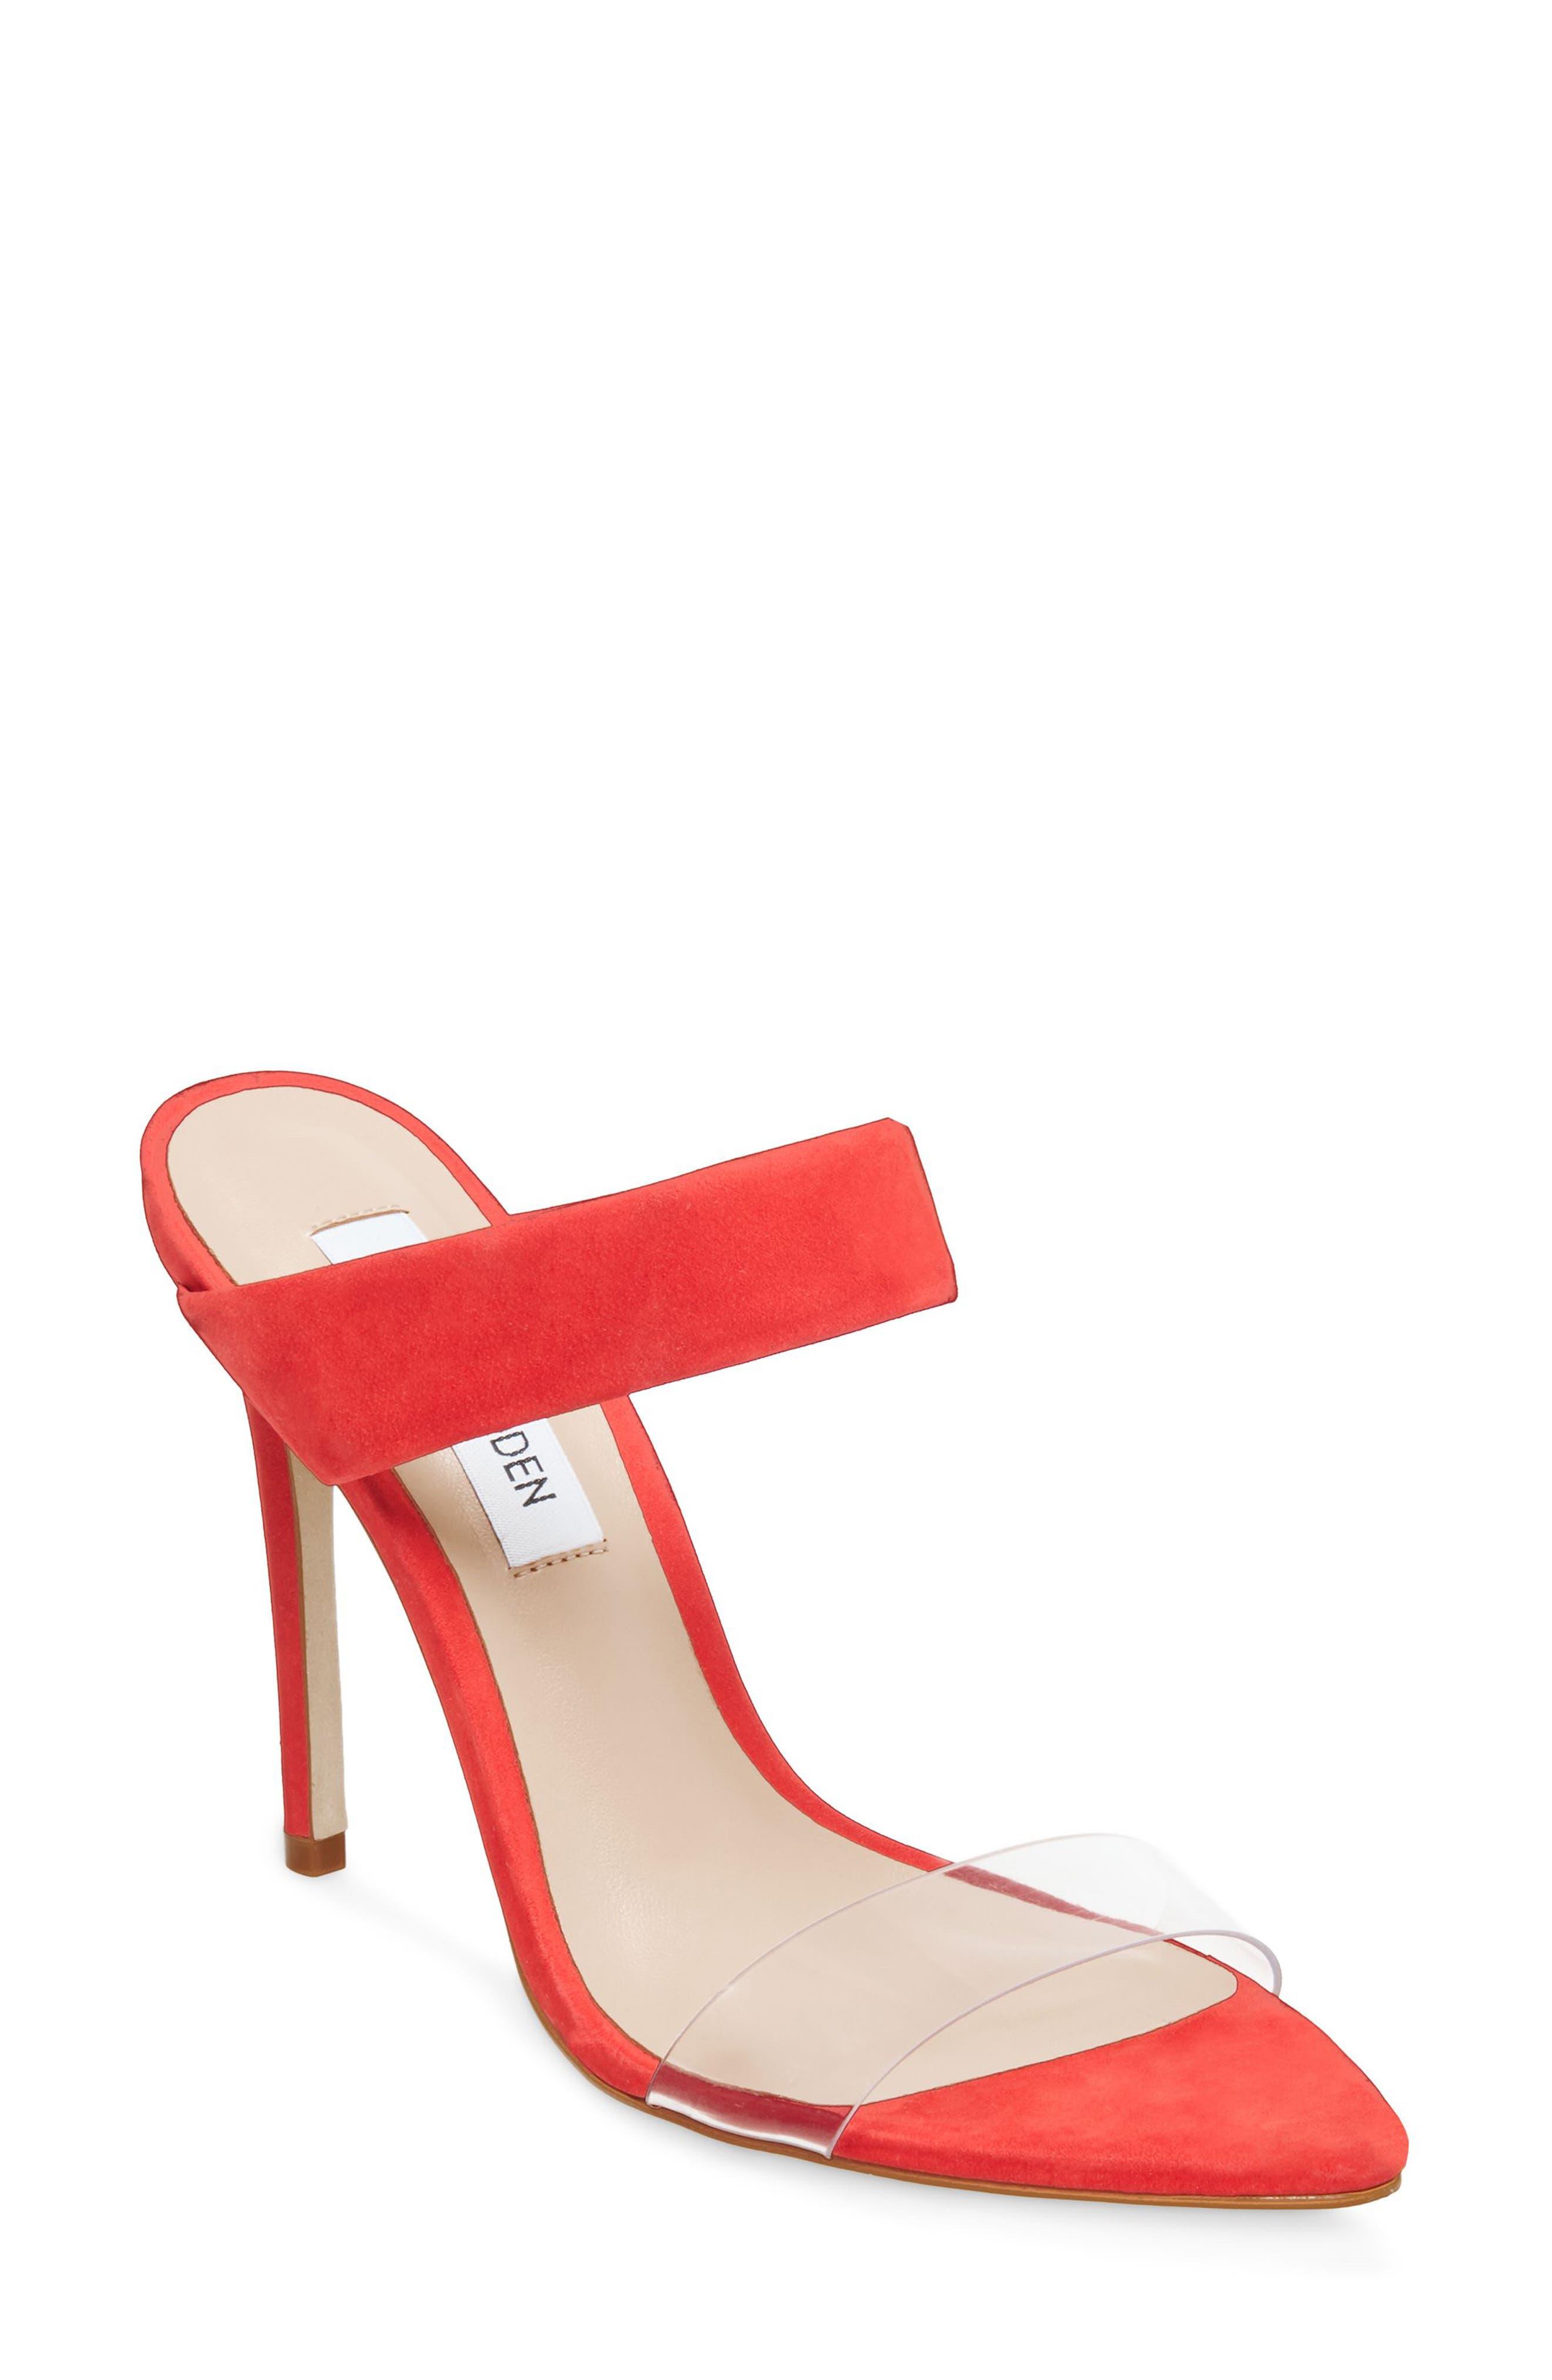 Steve Madden Amaya Clear Slide Sandal, Red